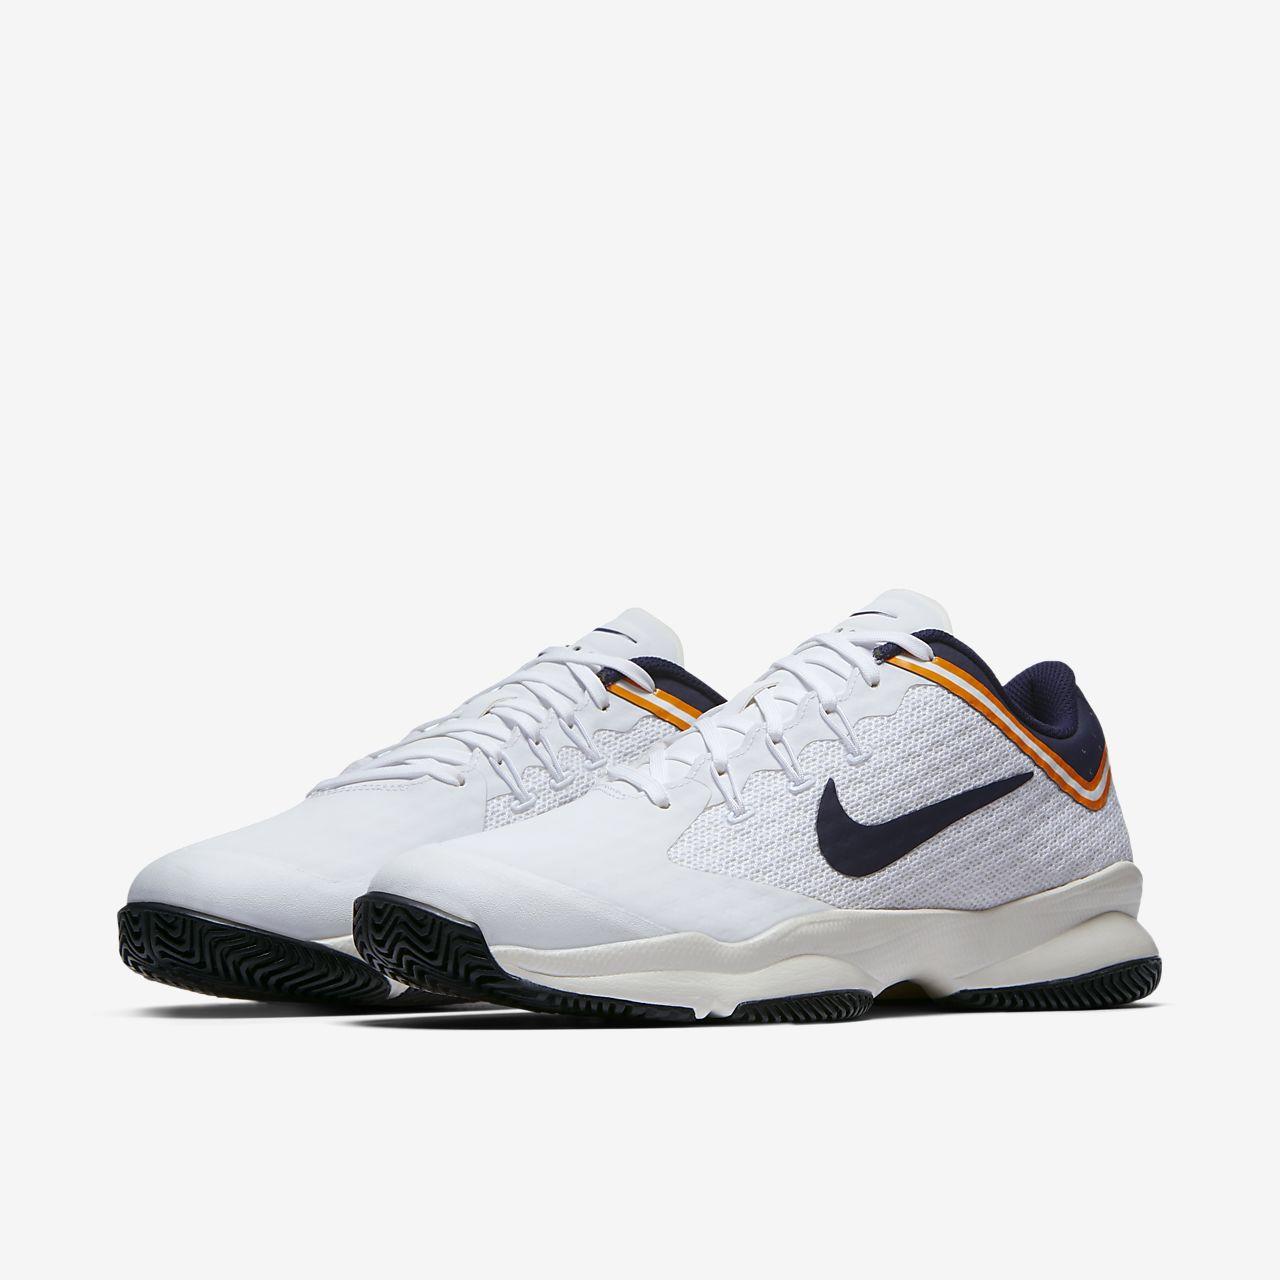 Nike PerformanceCOURT LITE CLAY - Outdoor tennis shoes - white/blackened blue/phantom/orange peel hE18kgzpvW